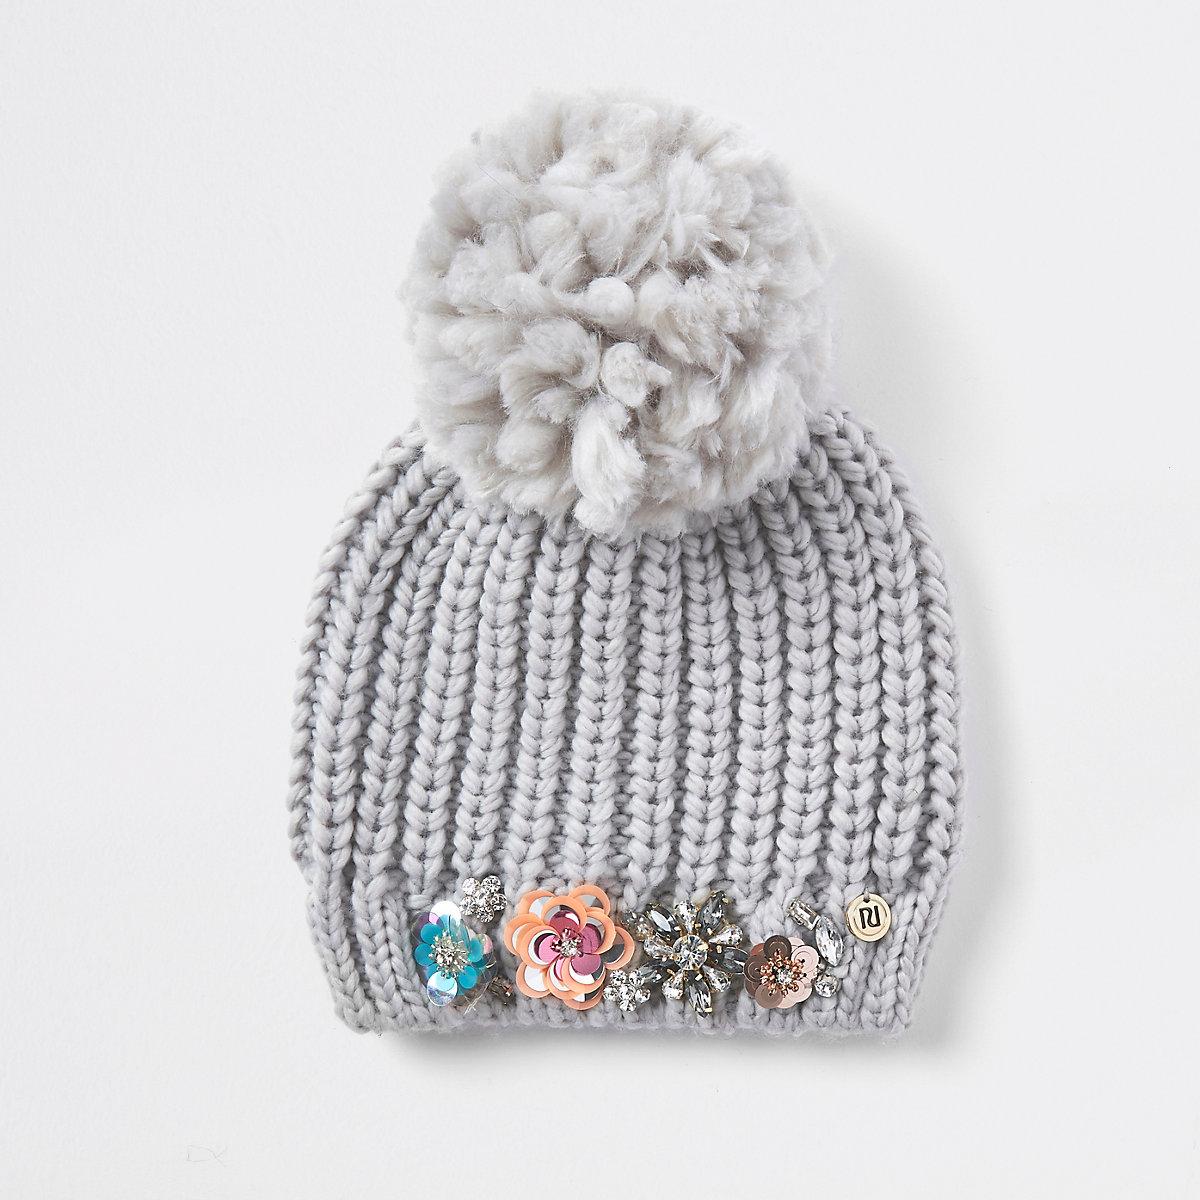 Grey knit embellished beanie hat